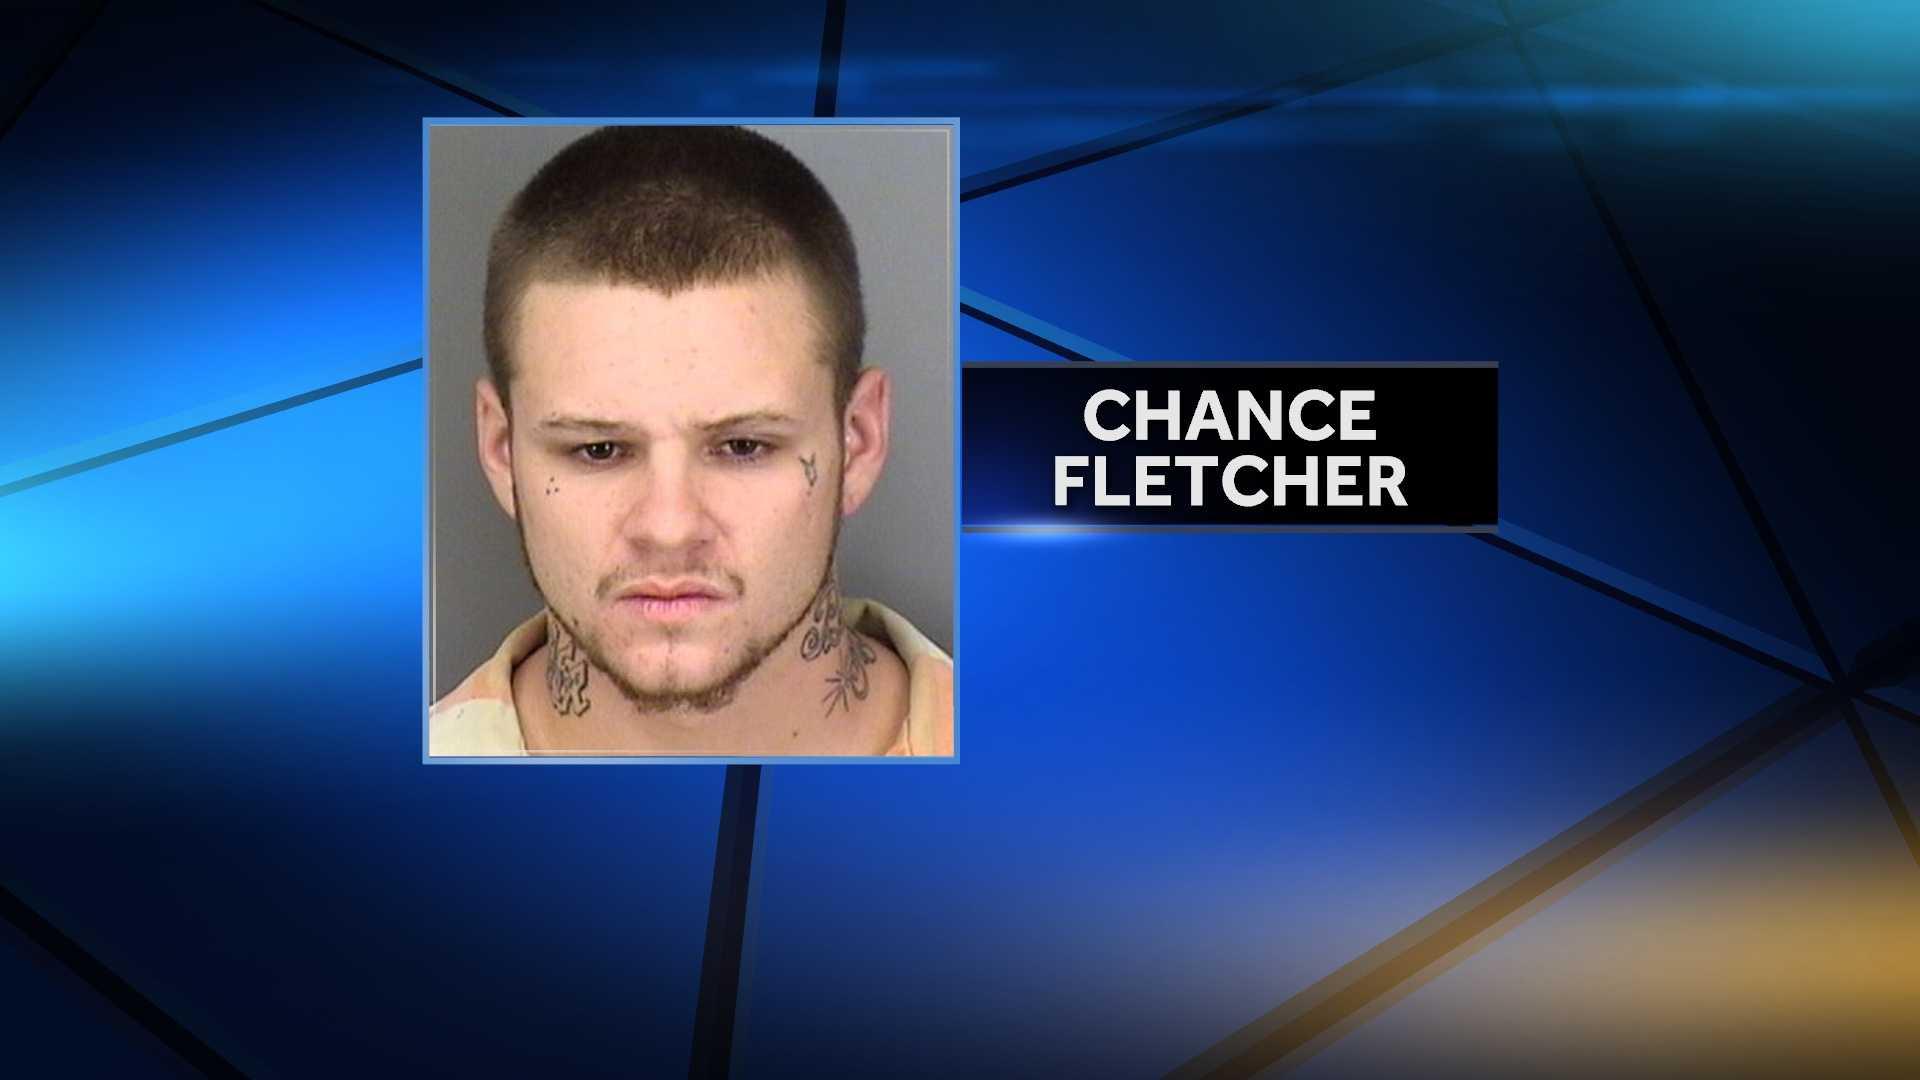 Chance Fletcher